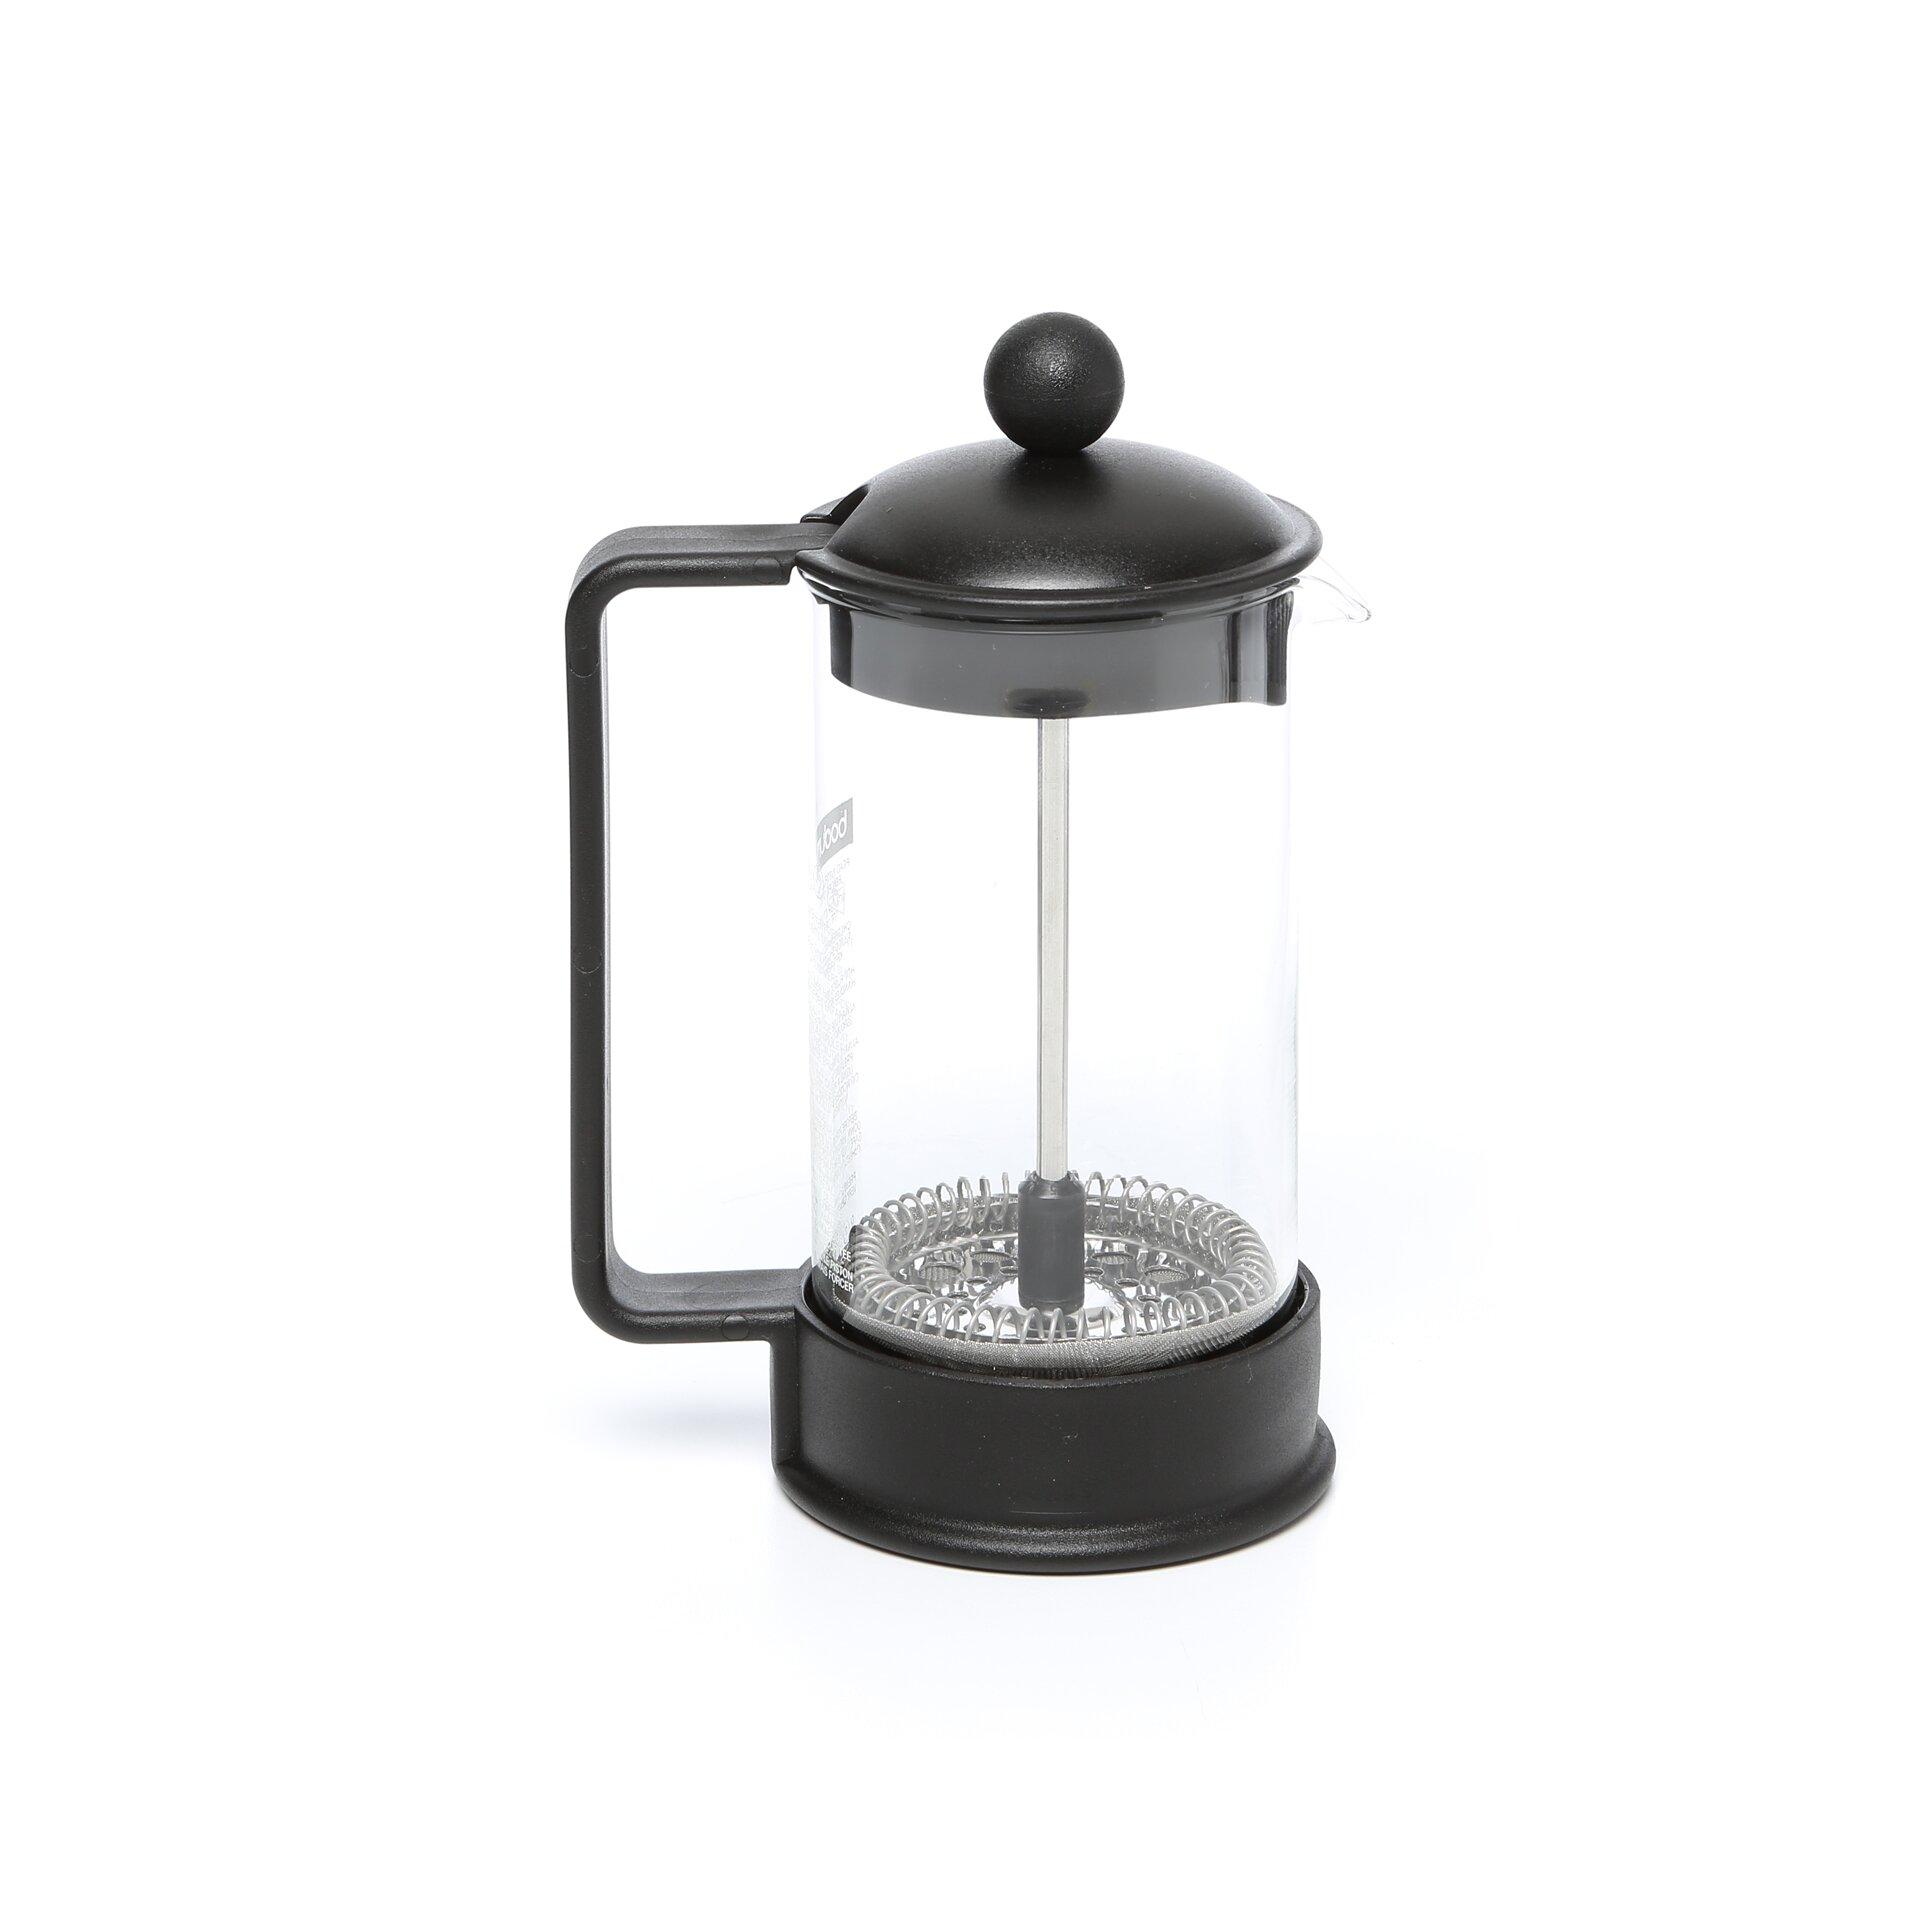 Bodum Brazil French Press Coffee Maker & Reviews Wayfair